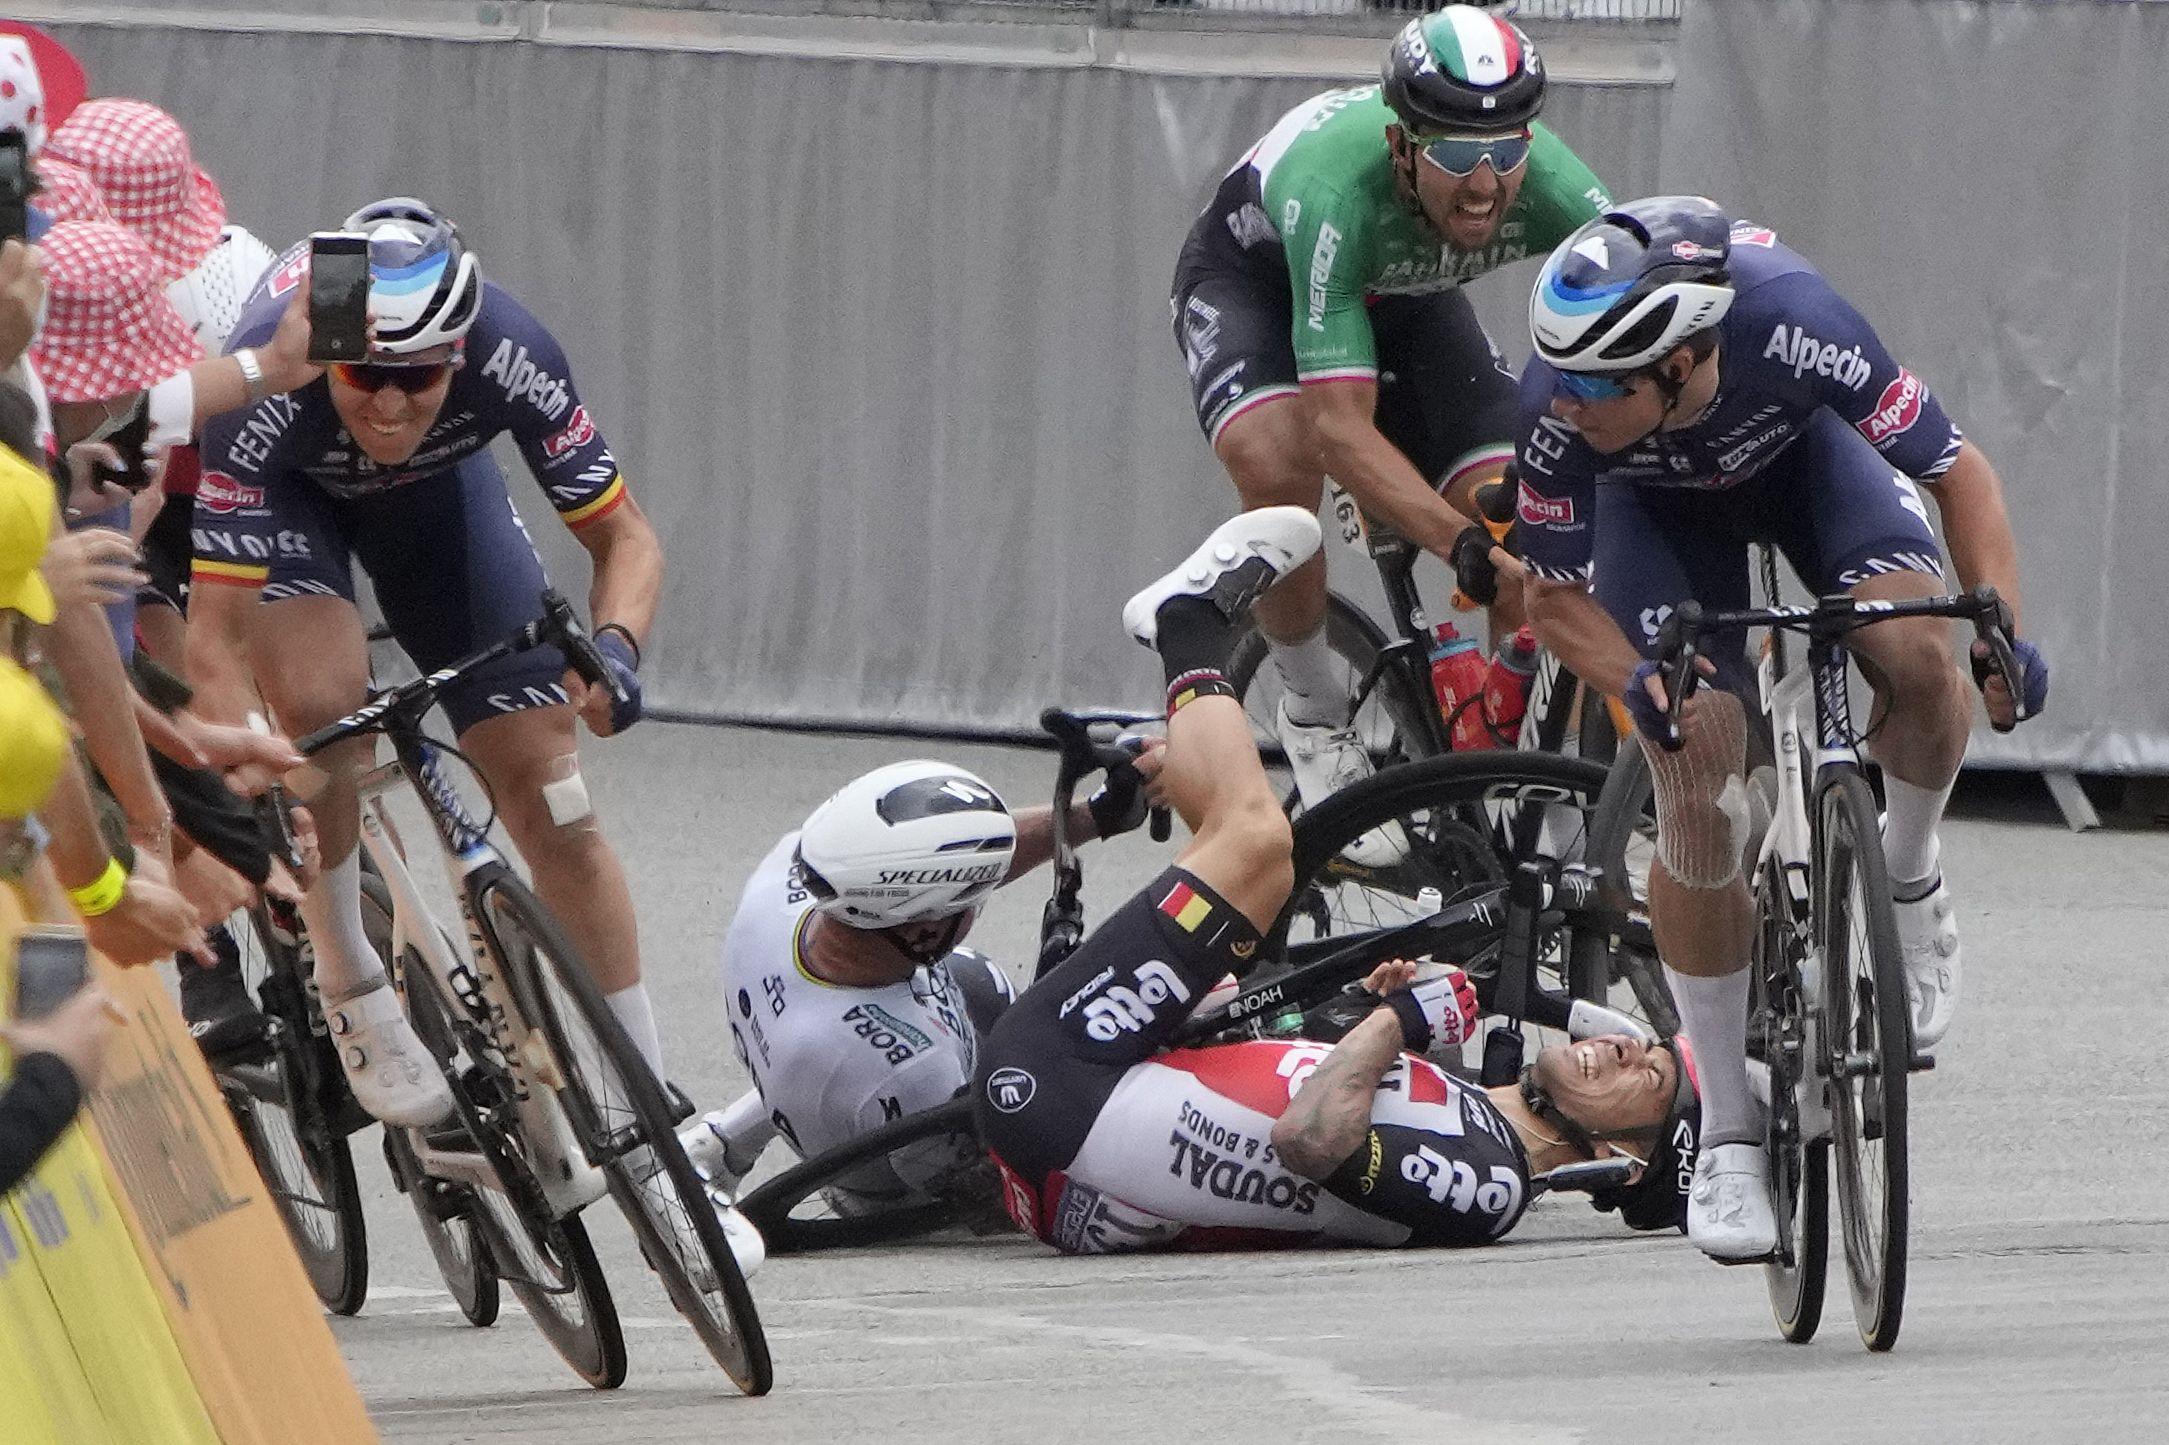 Caleb Ewan and Peter Sagan go down hard.